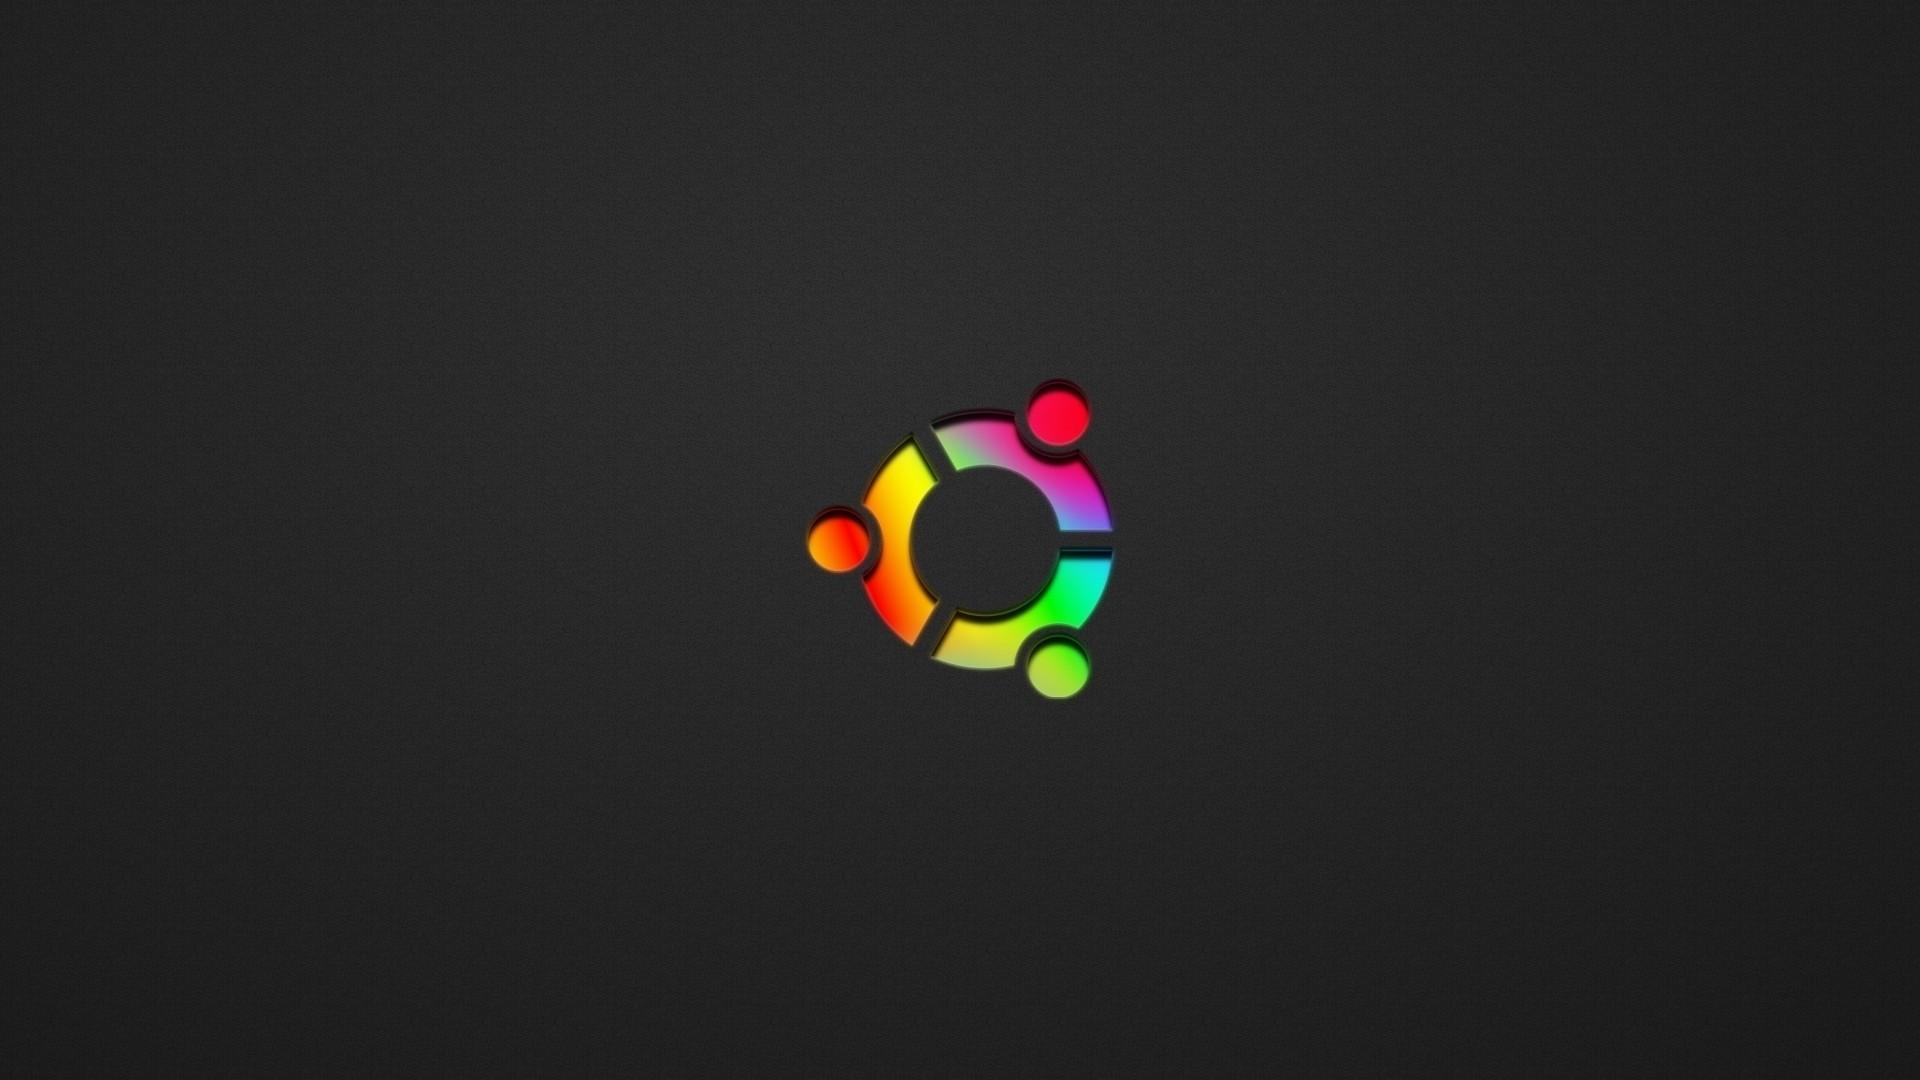 Sfondi Natalizi Apple.Sfondi Arcobaleno 73 Immagini